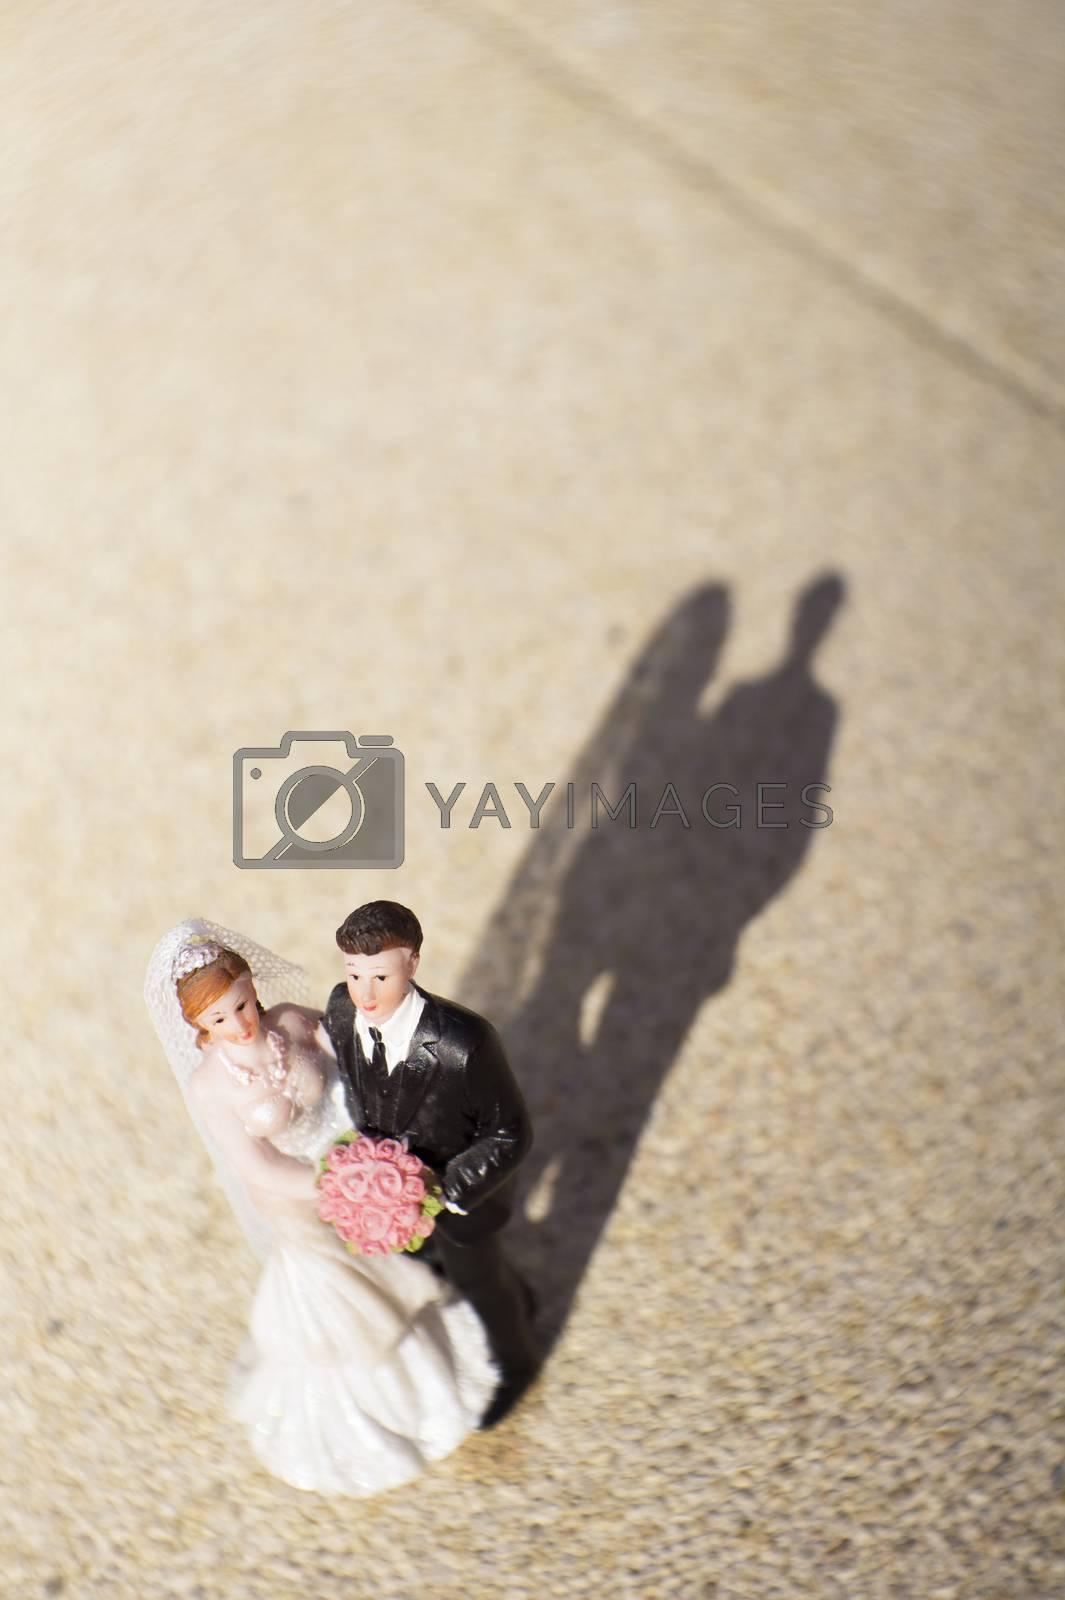 Standard figure of wedding couple on beige floor. No people